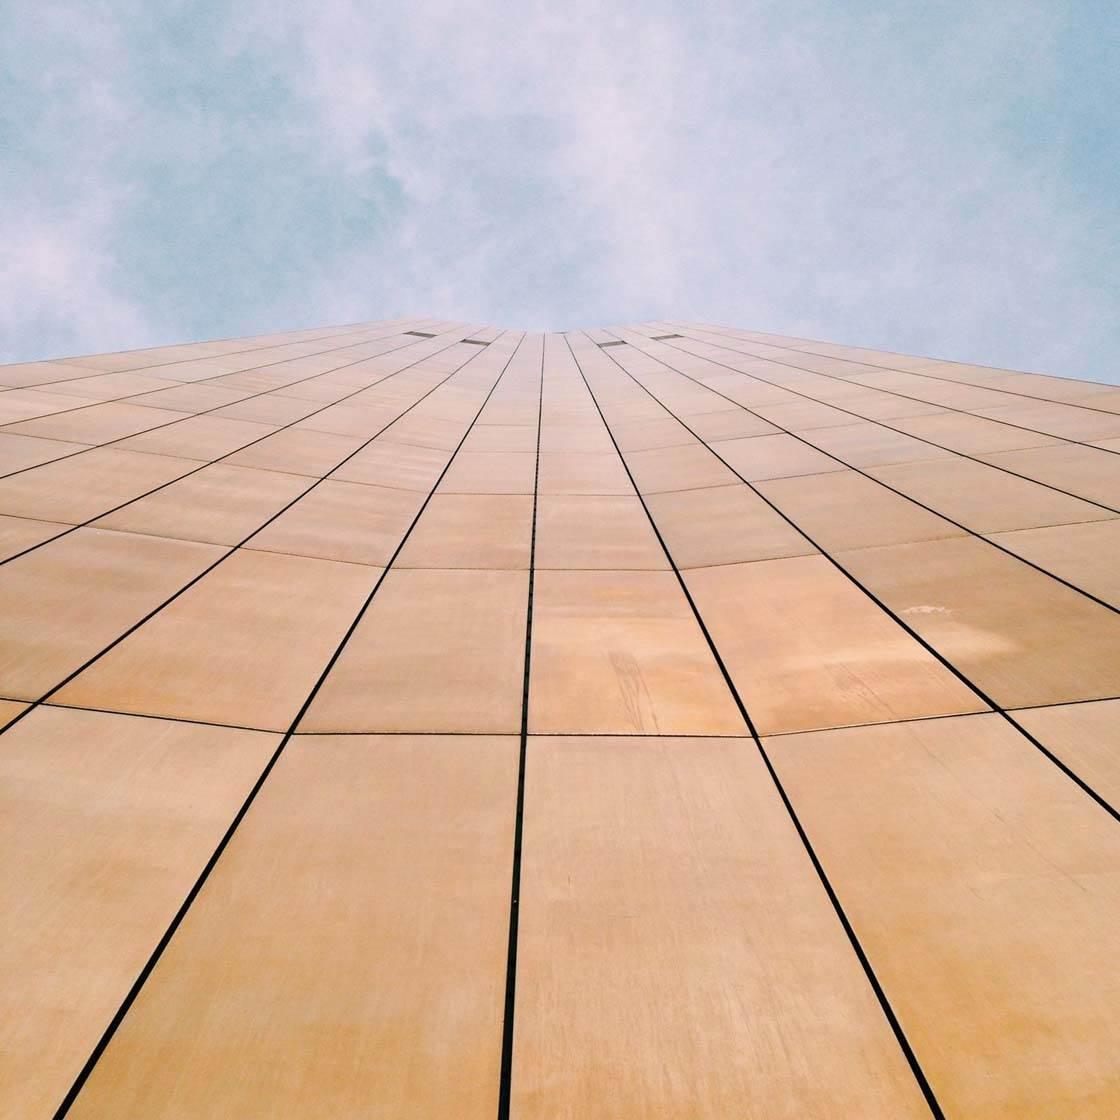 iPhone Photo Buildings 9 no script